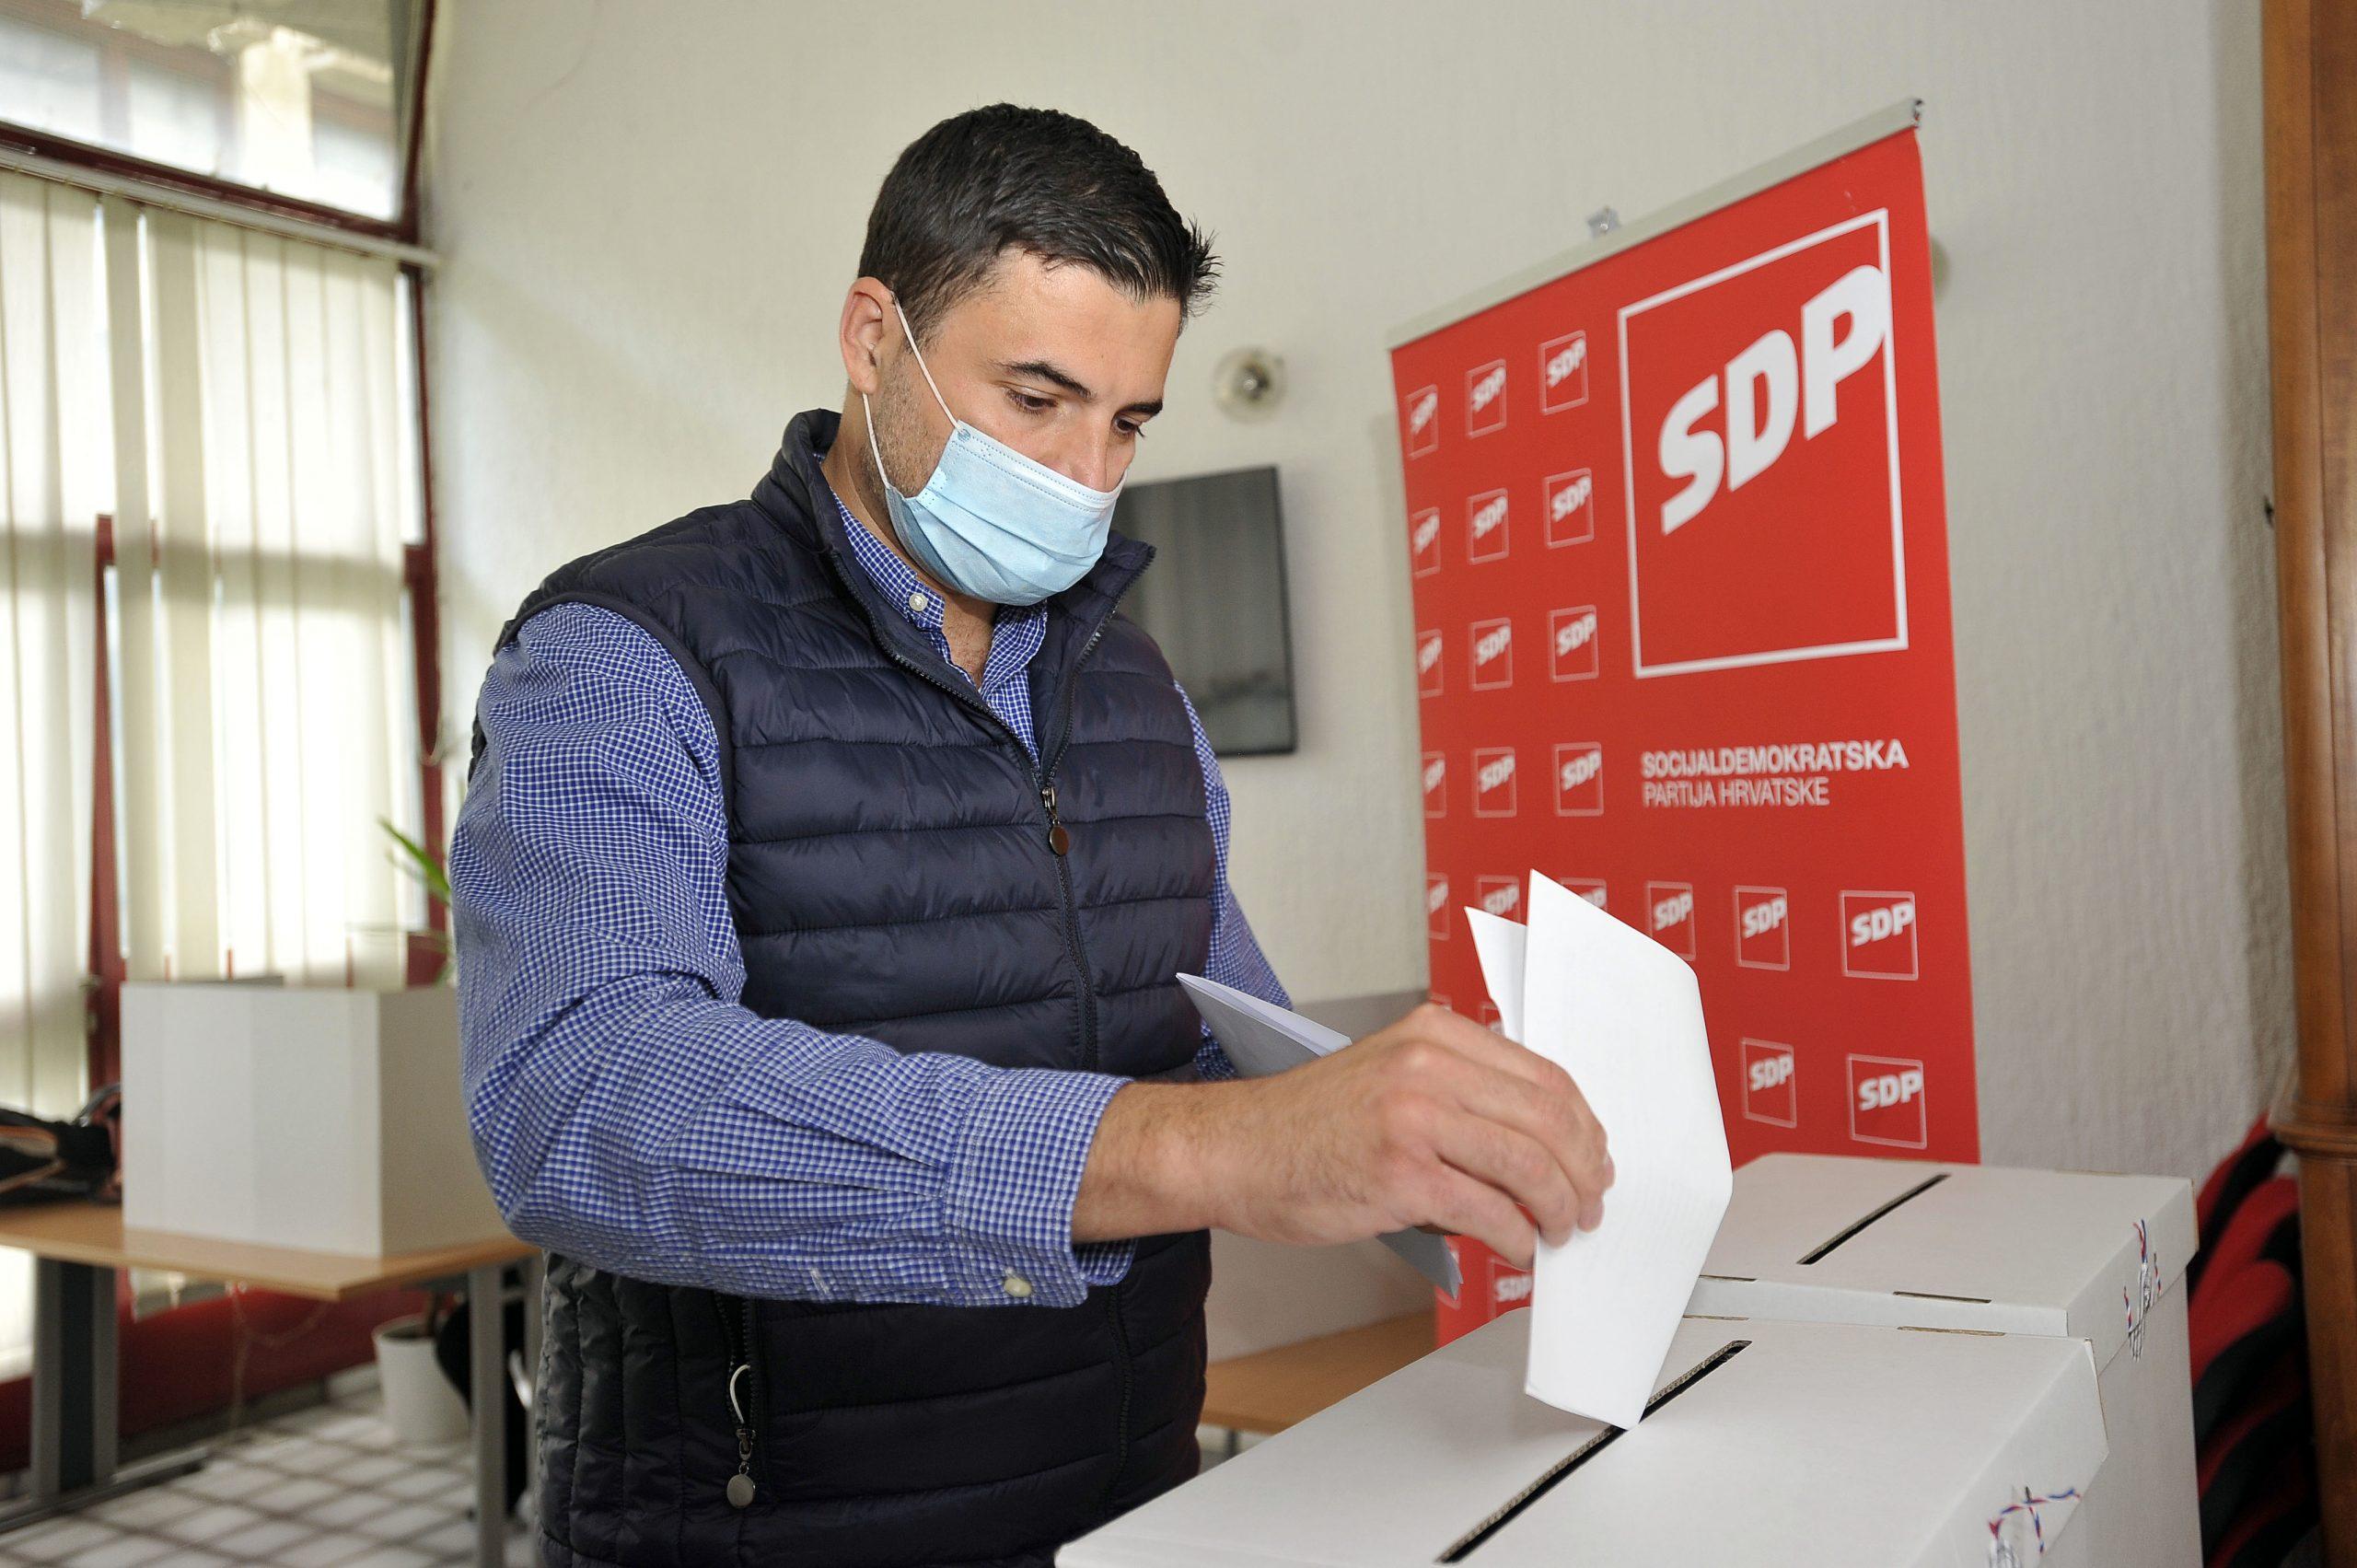 Davor Bernardić glasovao je u Novom Zagrebu / Snimio Davor KOVAČEVIĆ